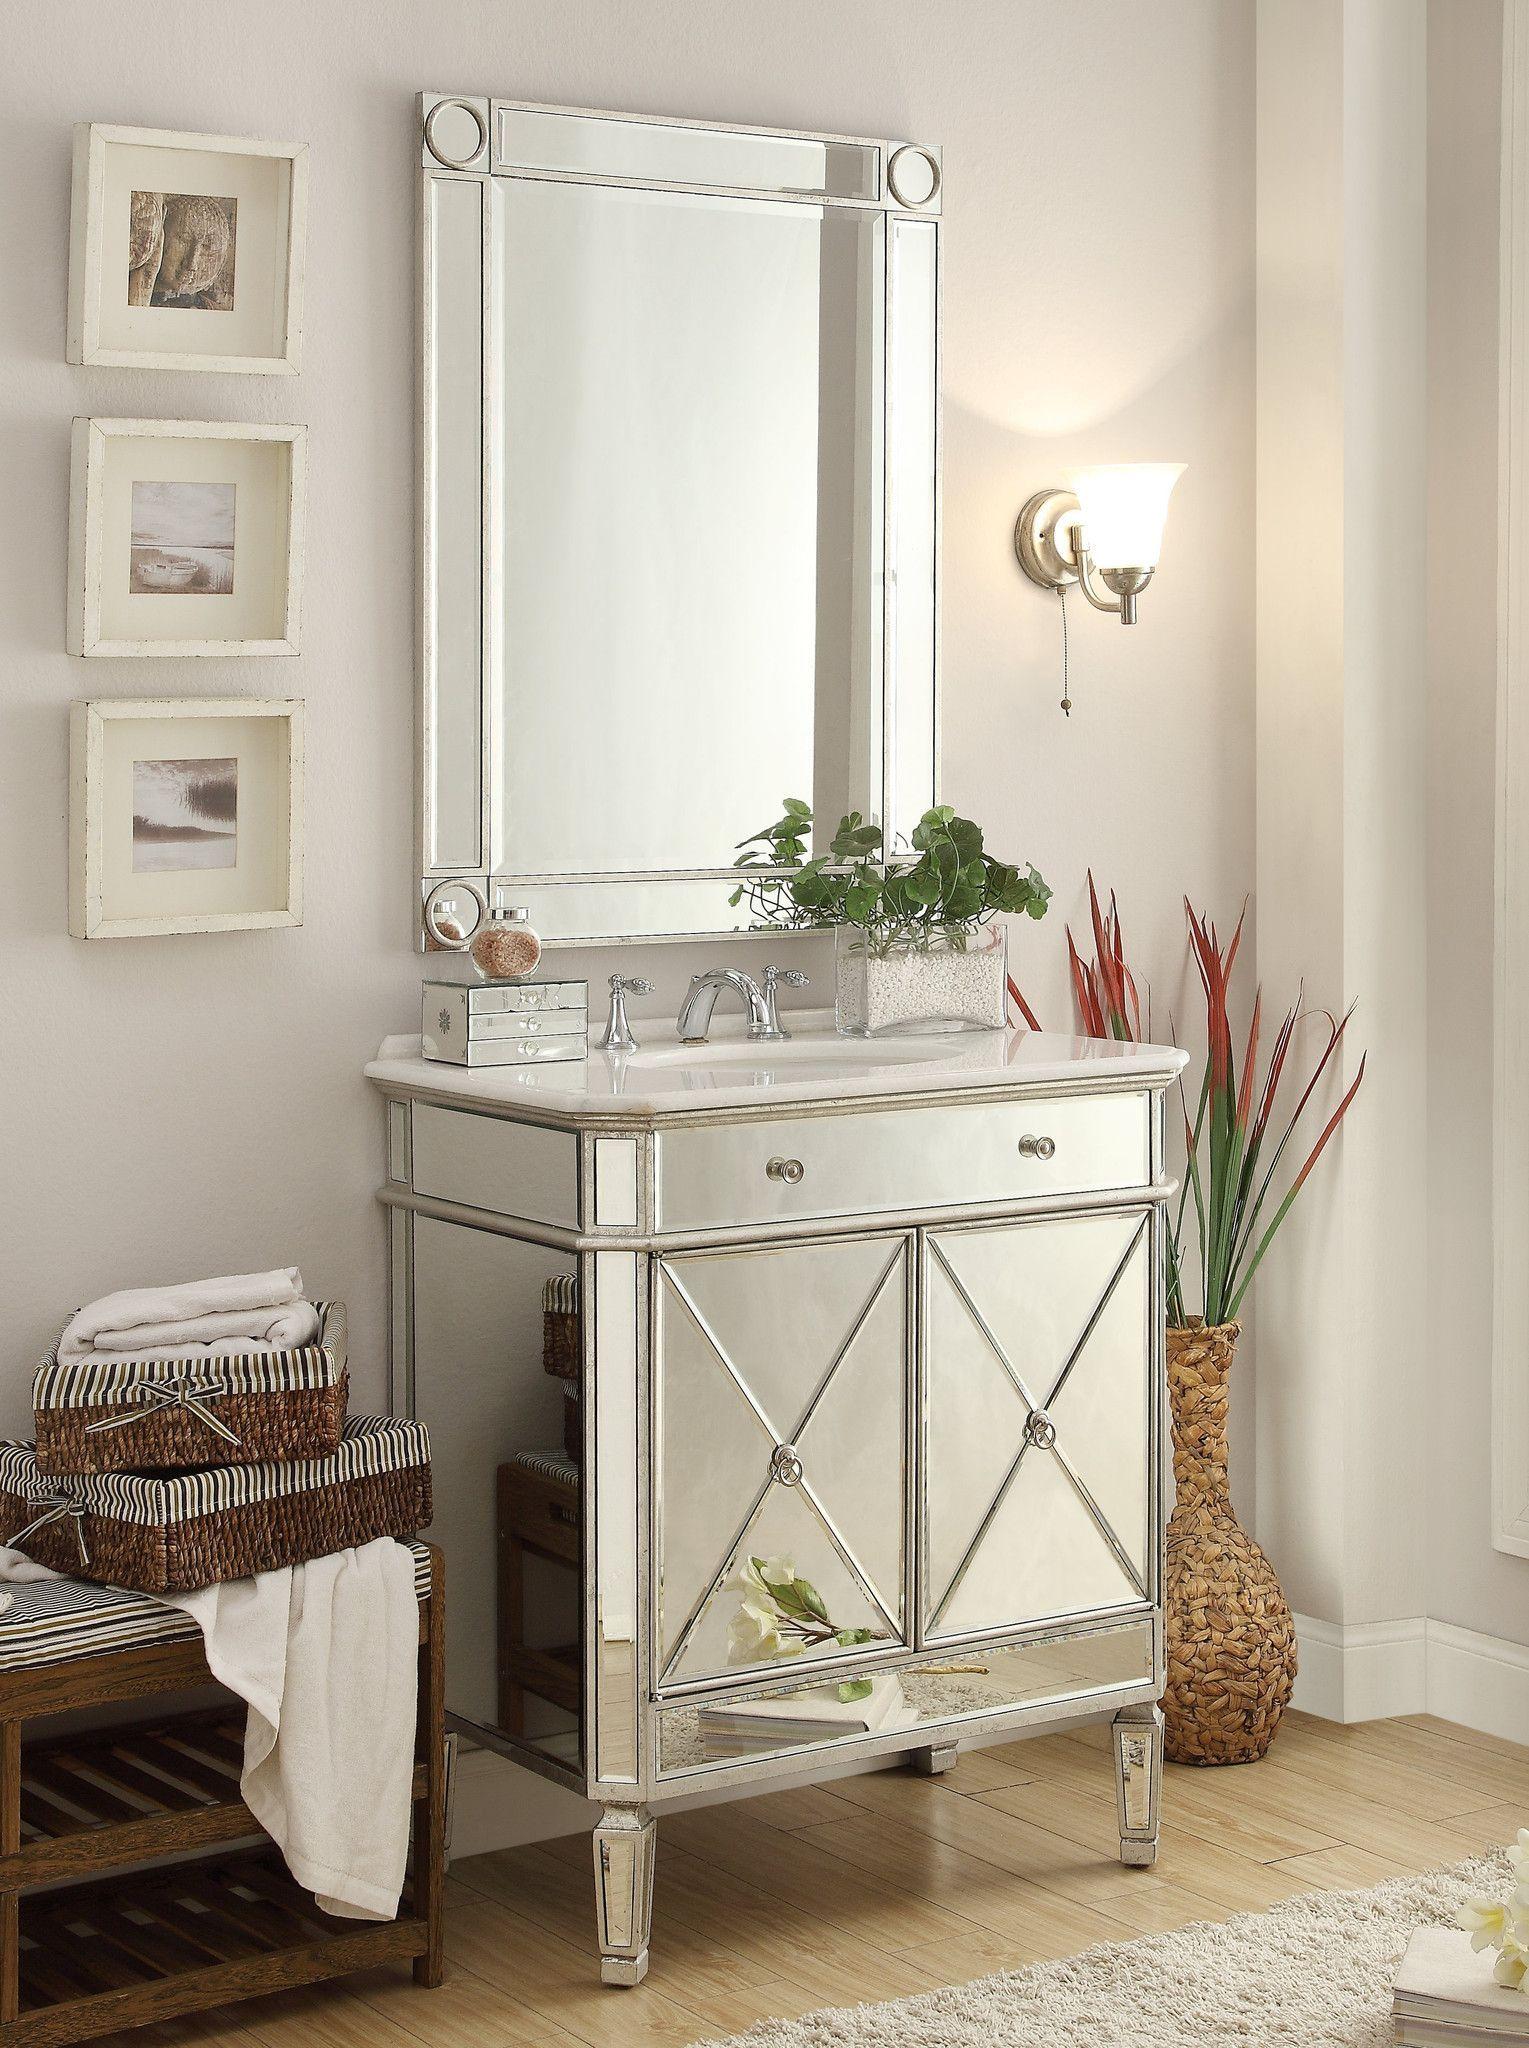 32 Benton Collection Mirror Reflection Austell Bathroom Sink Vanity 505ra Silver Leaf Finish No Mirror In 2021 Bathroom Sink Vanity Bathroom Vanity Vanity Sink Mirrored bathroom vanity with sink